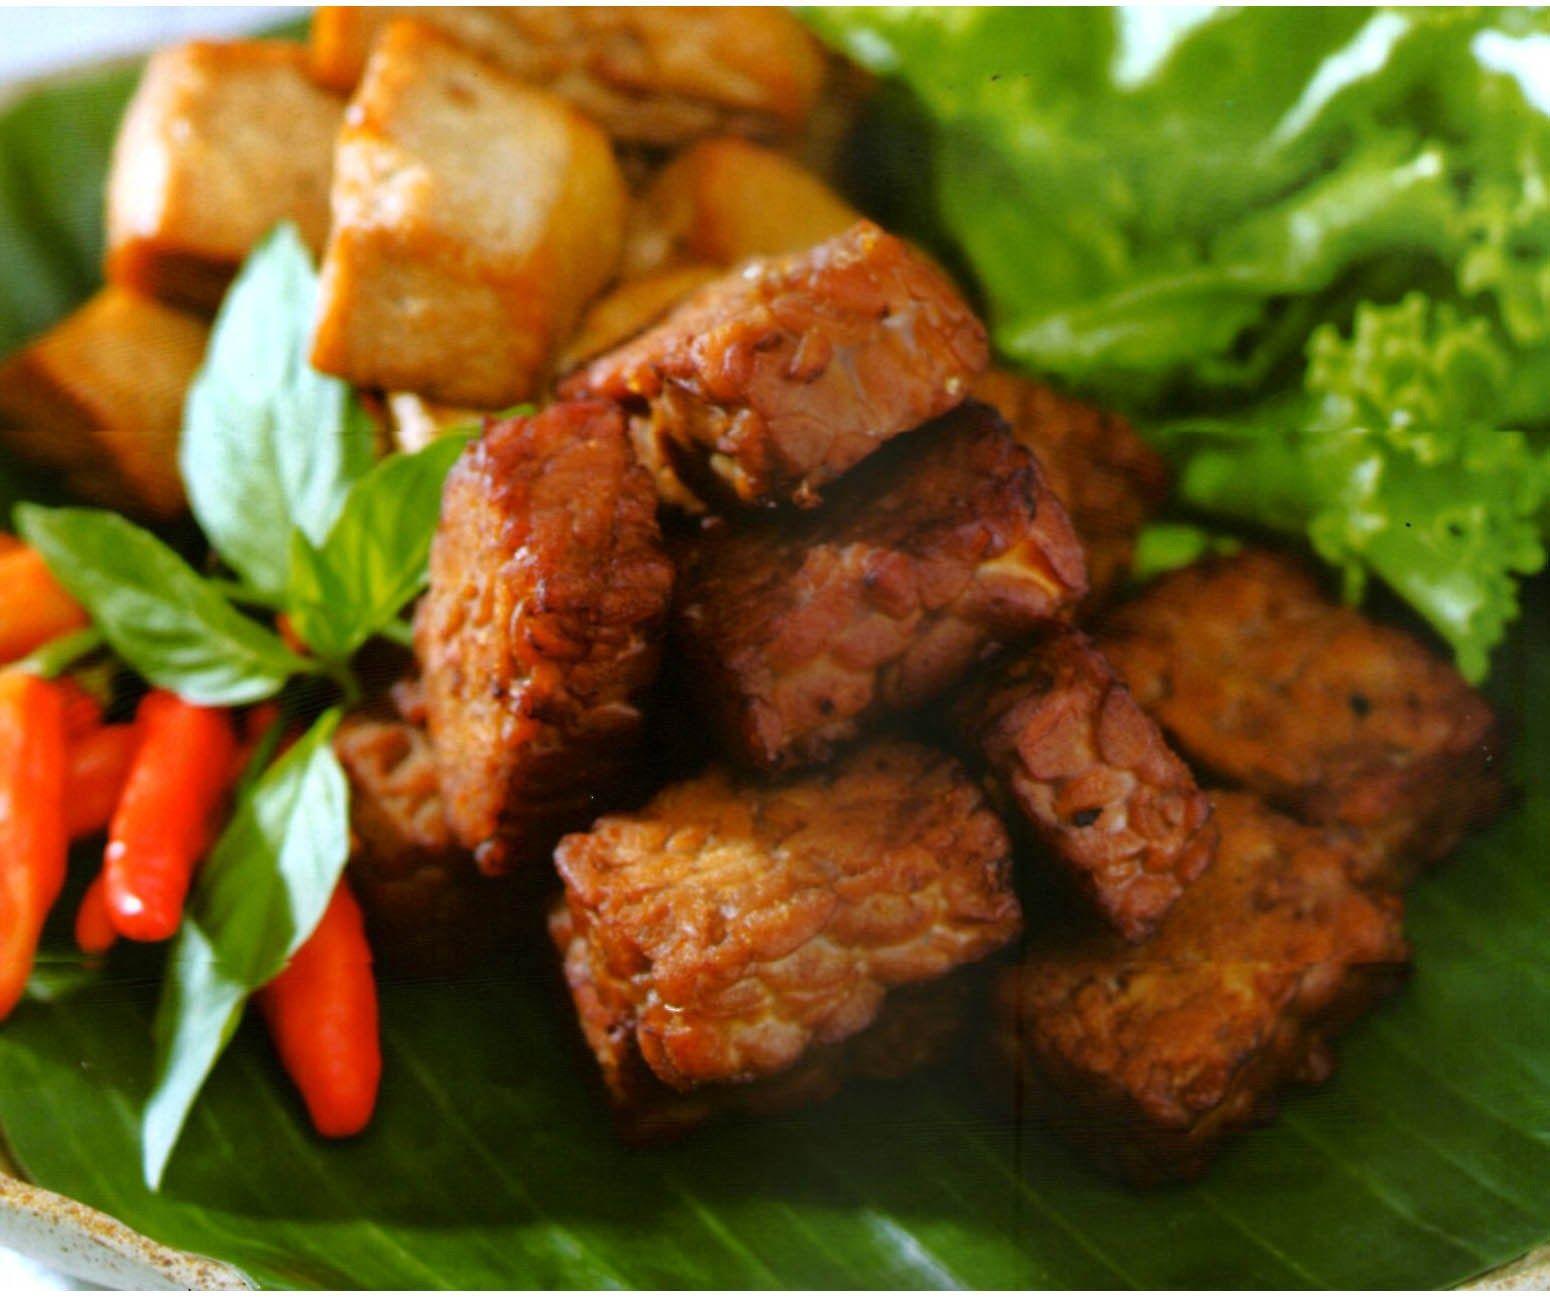 Resep Tempe Tahu Bacem Aneka Lauk Camilan Camilan Basah Masakan Indonesia Resep Masakan Resep Tempe Resep Masakan Resep